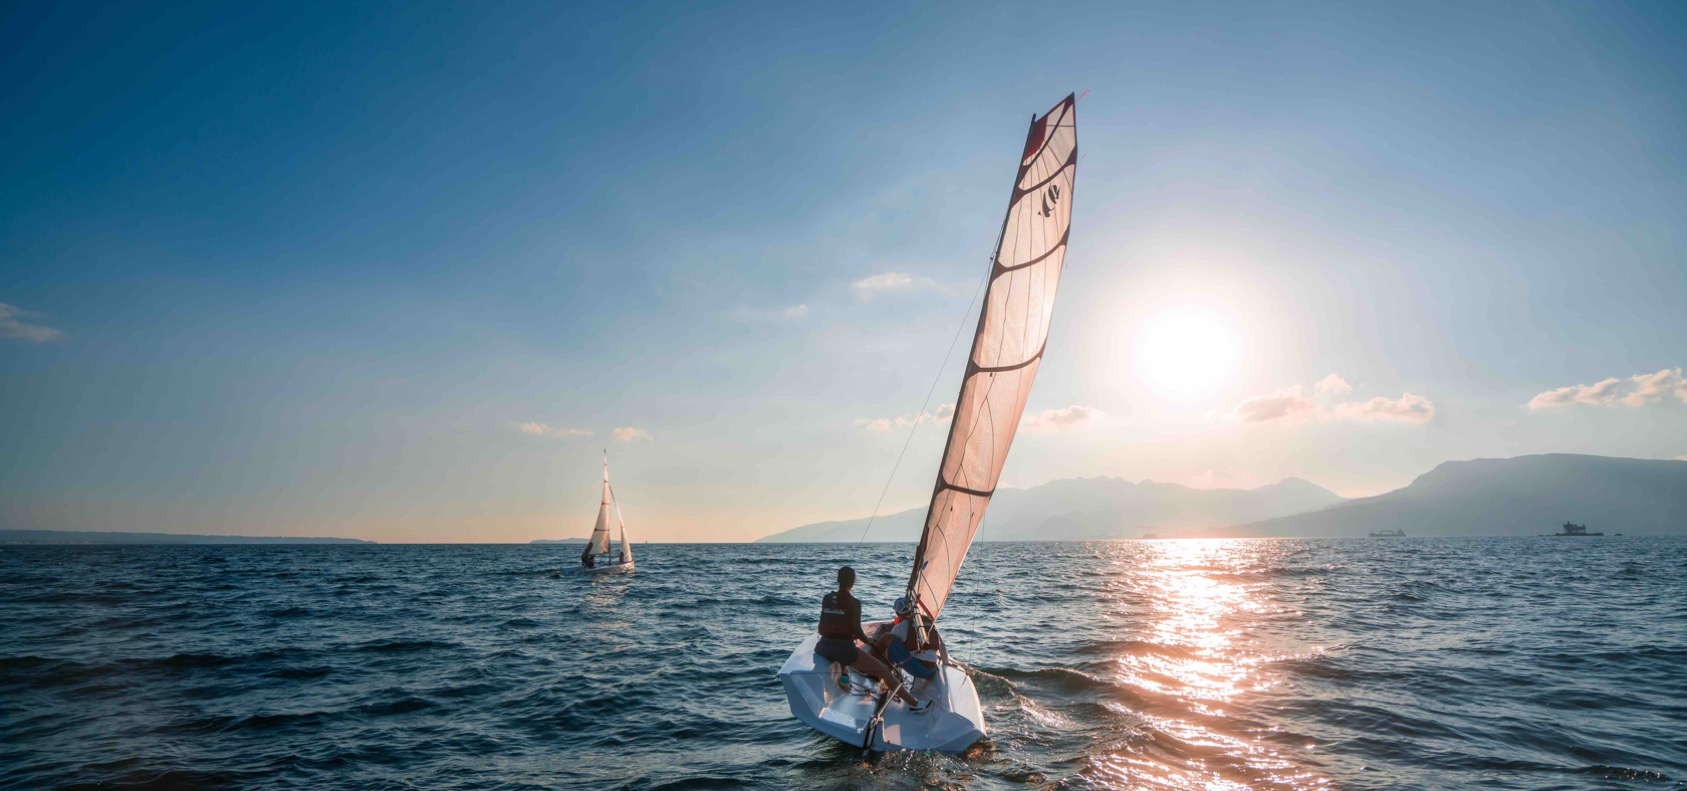 Europa Sailing School